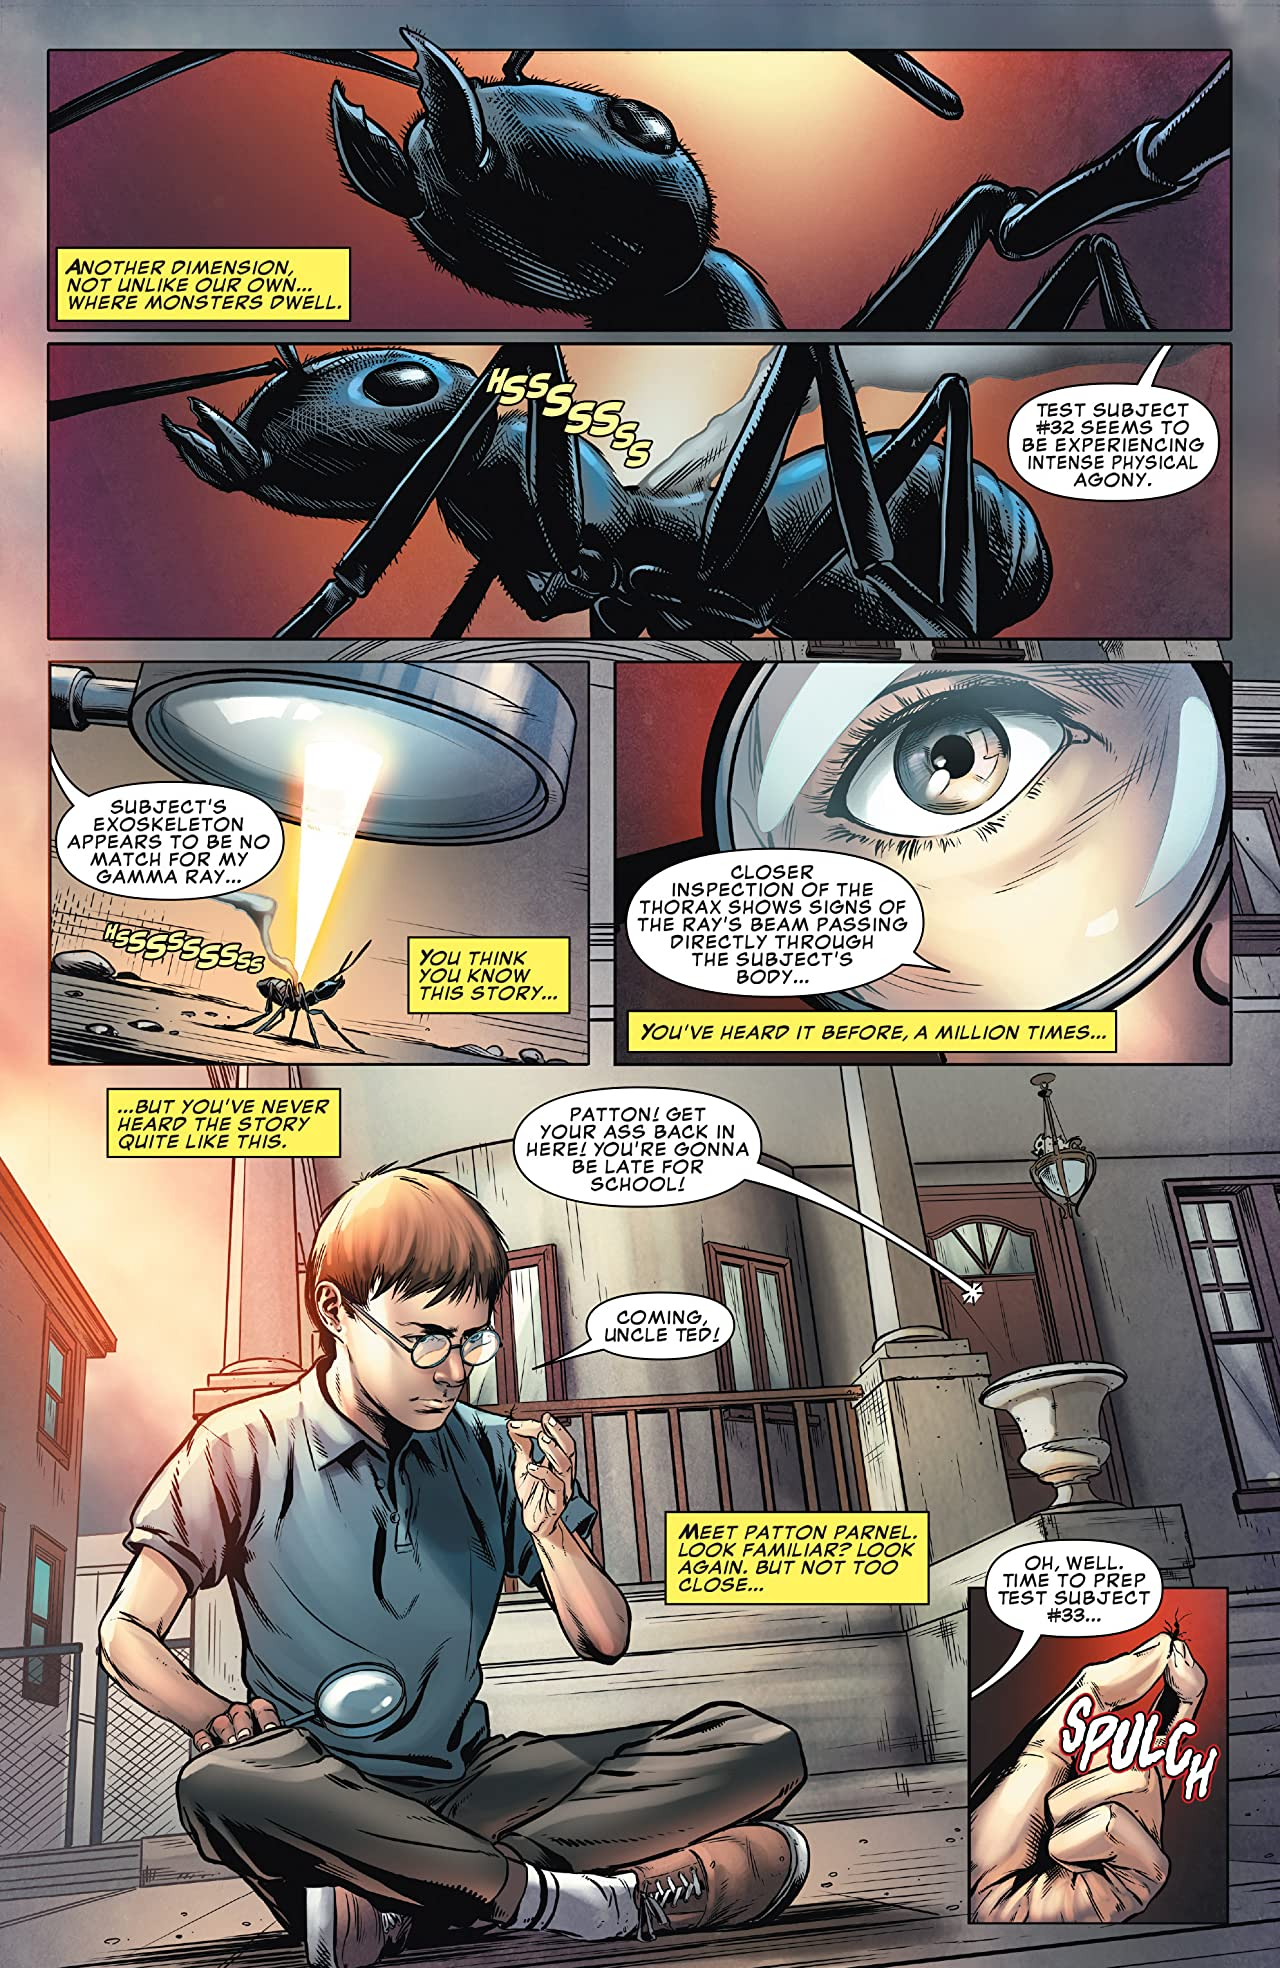 Edge of Spider-Verse #4 (of 5)